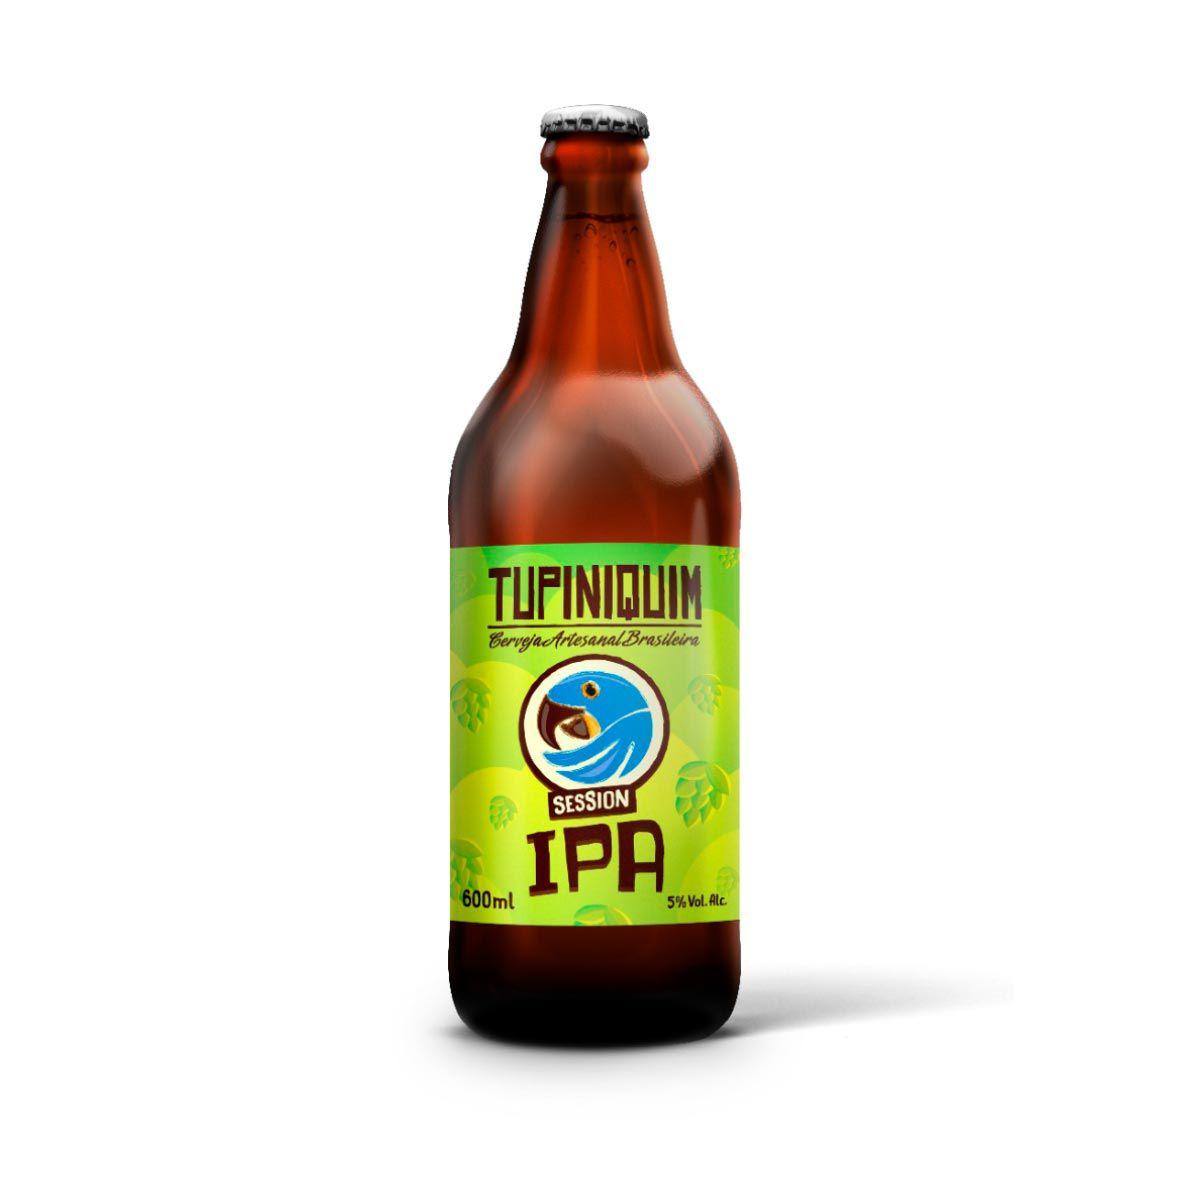 Tupiniquim Session IPA 600ml